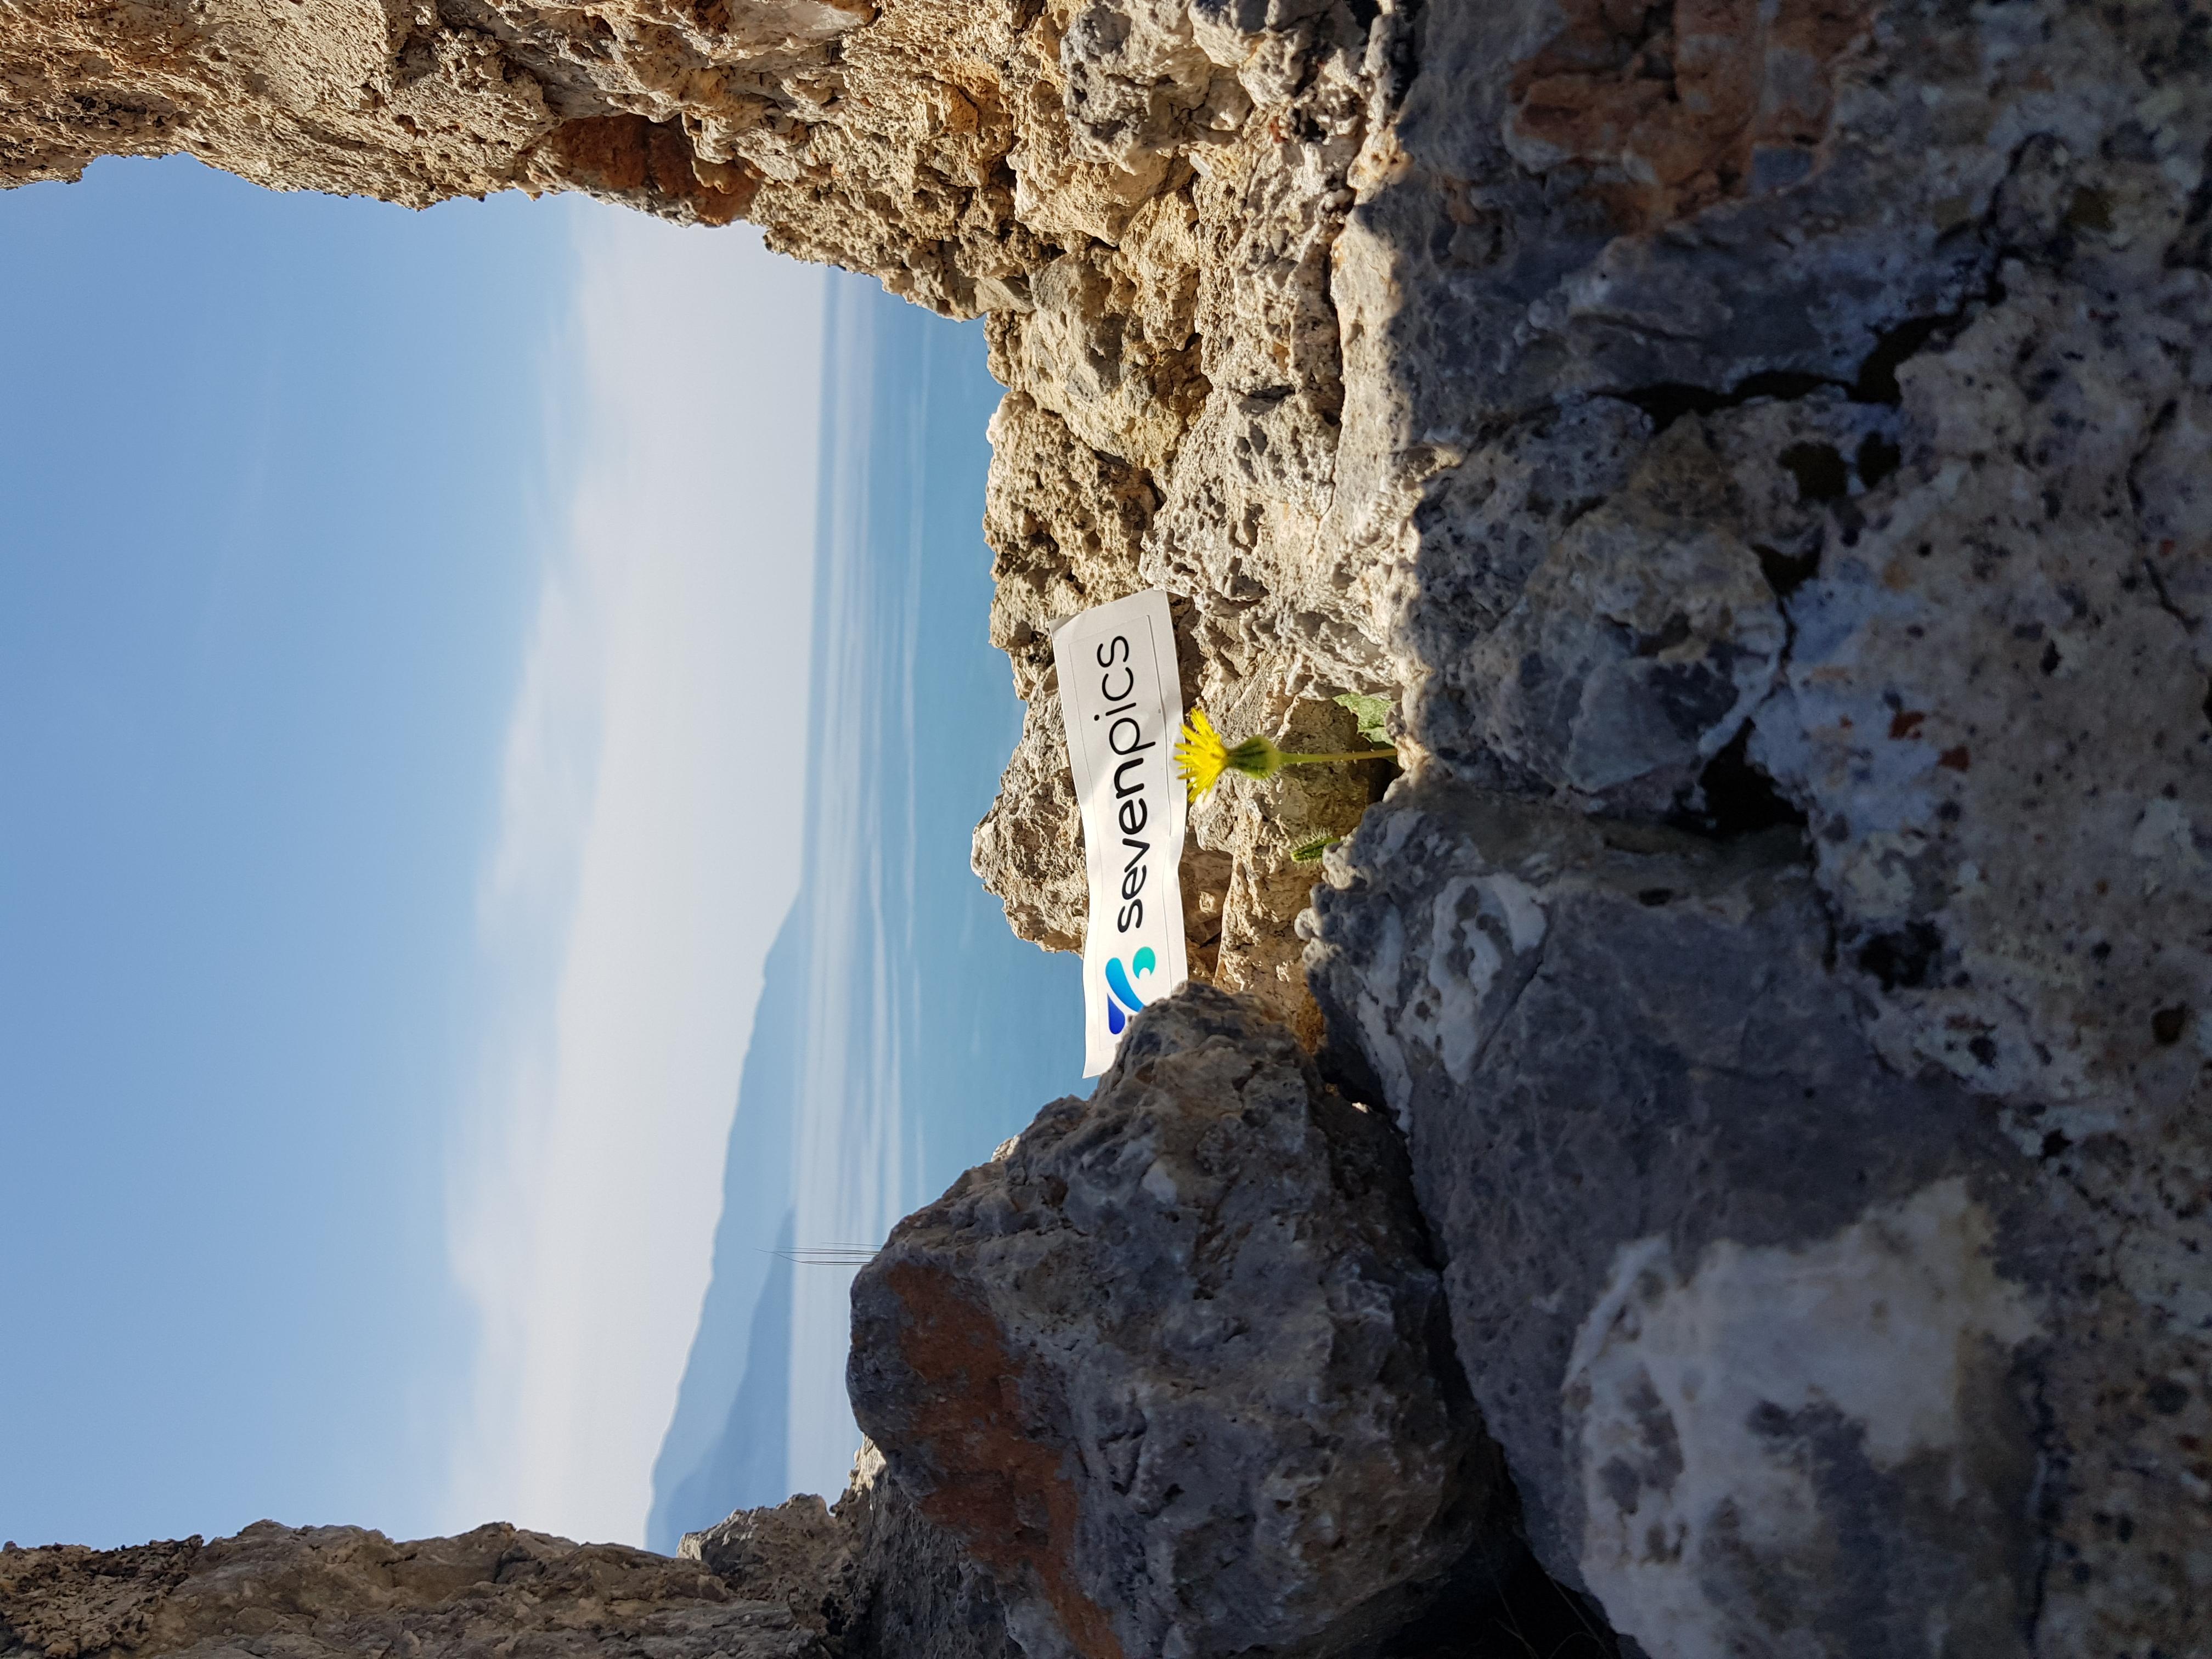 Путешествие с Seven Pics по острову Гемилер, Турция